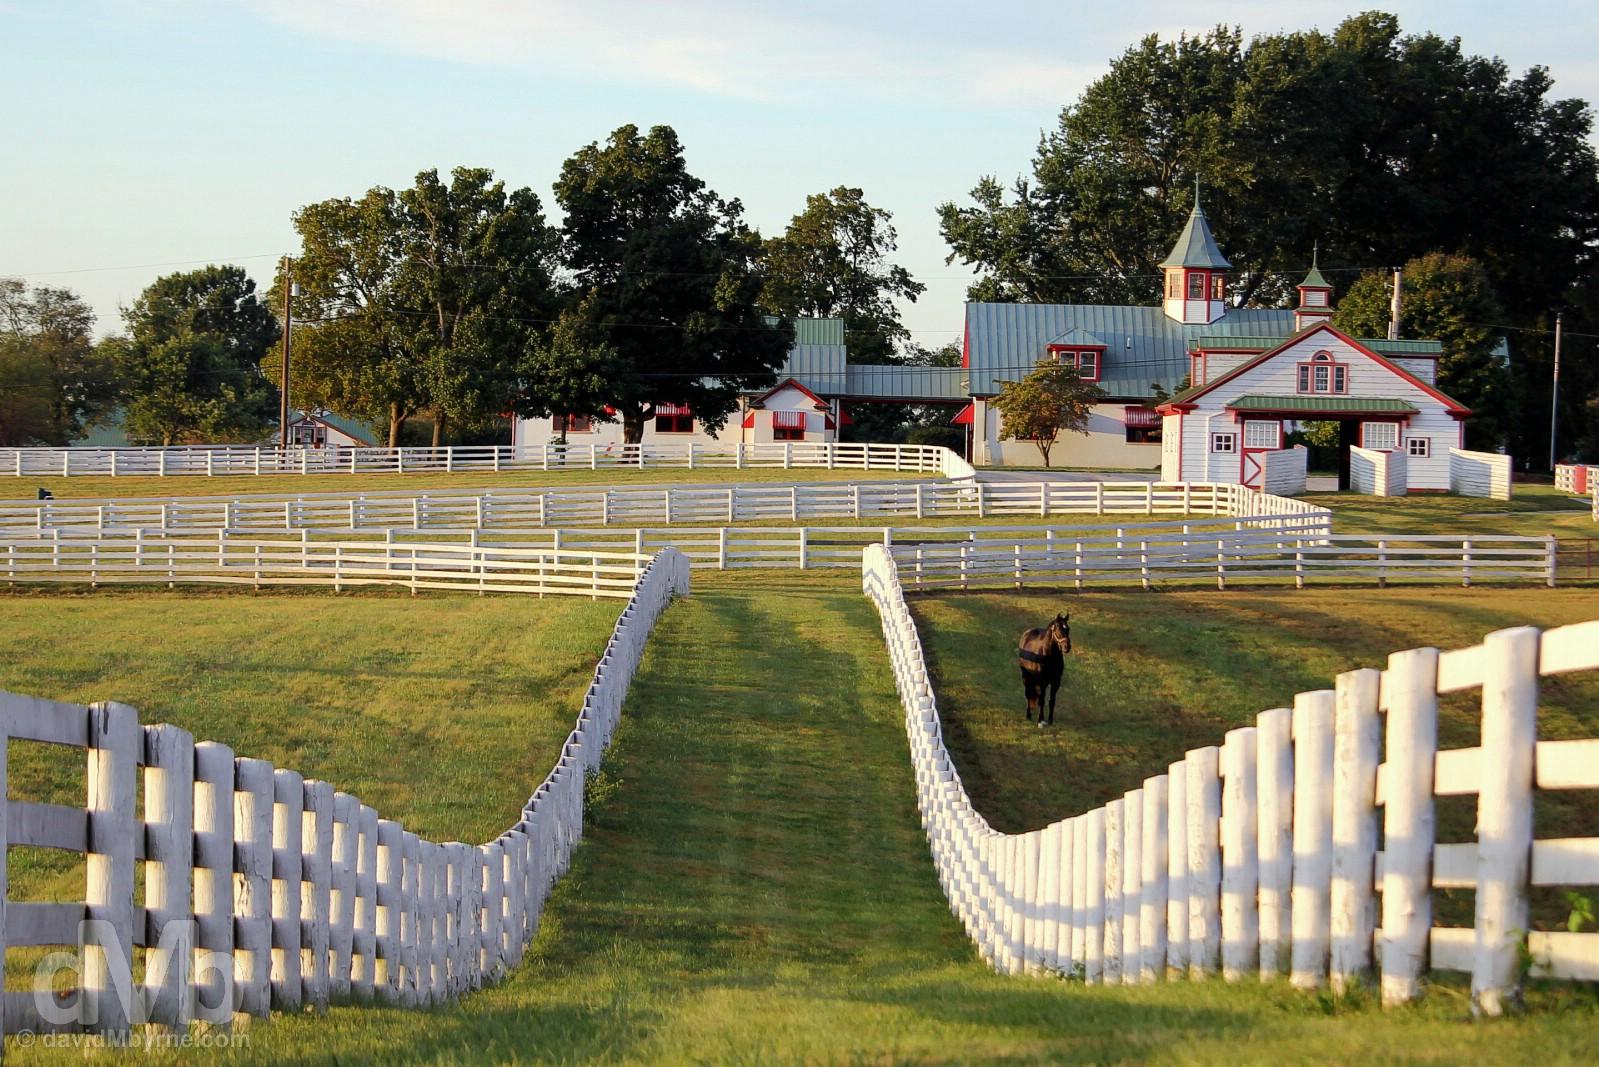 Late afternoon shadows at Calumet Farm in Lexington, Kentucky, USA. September 26, 2016.